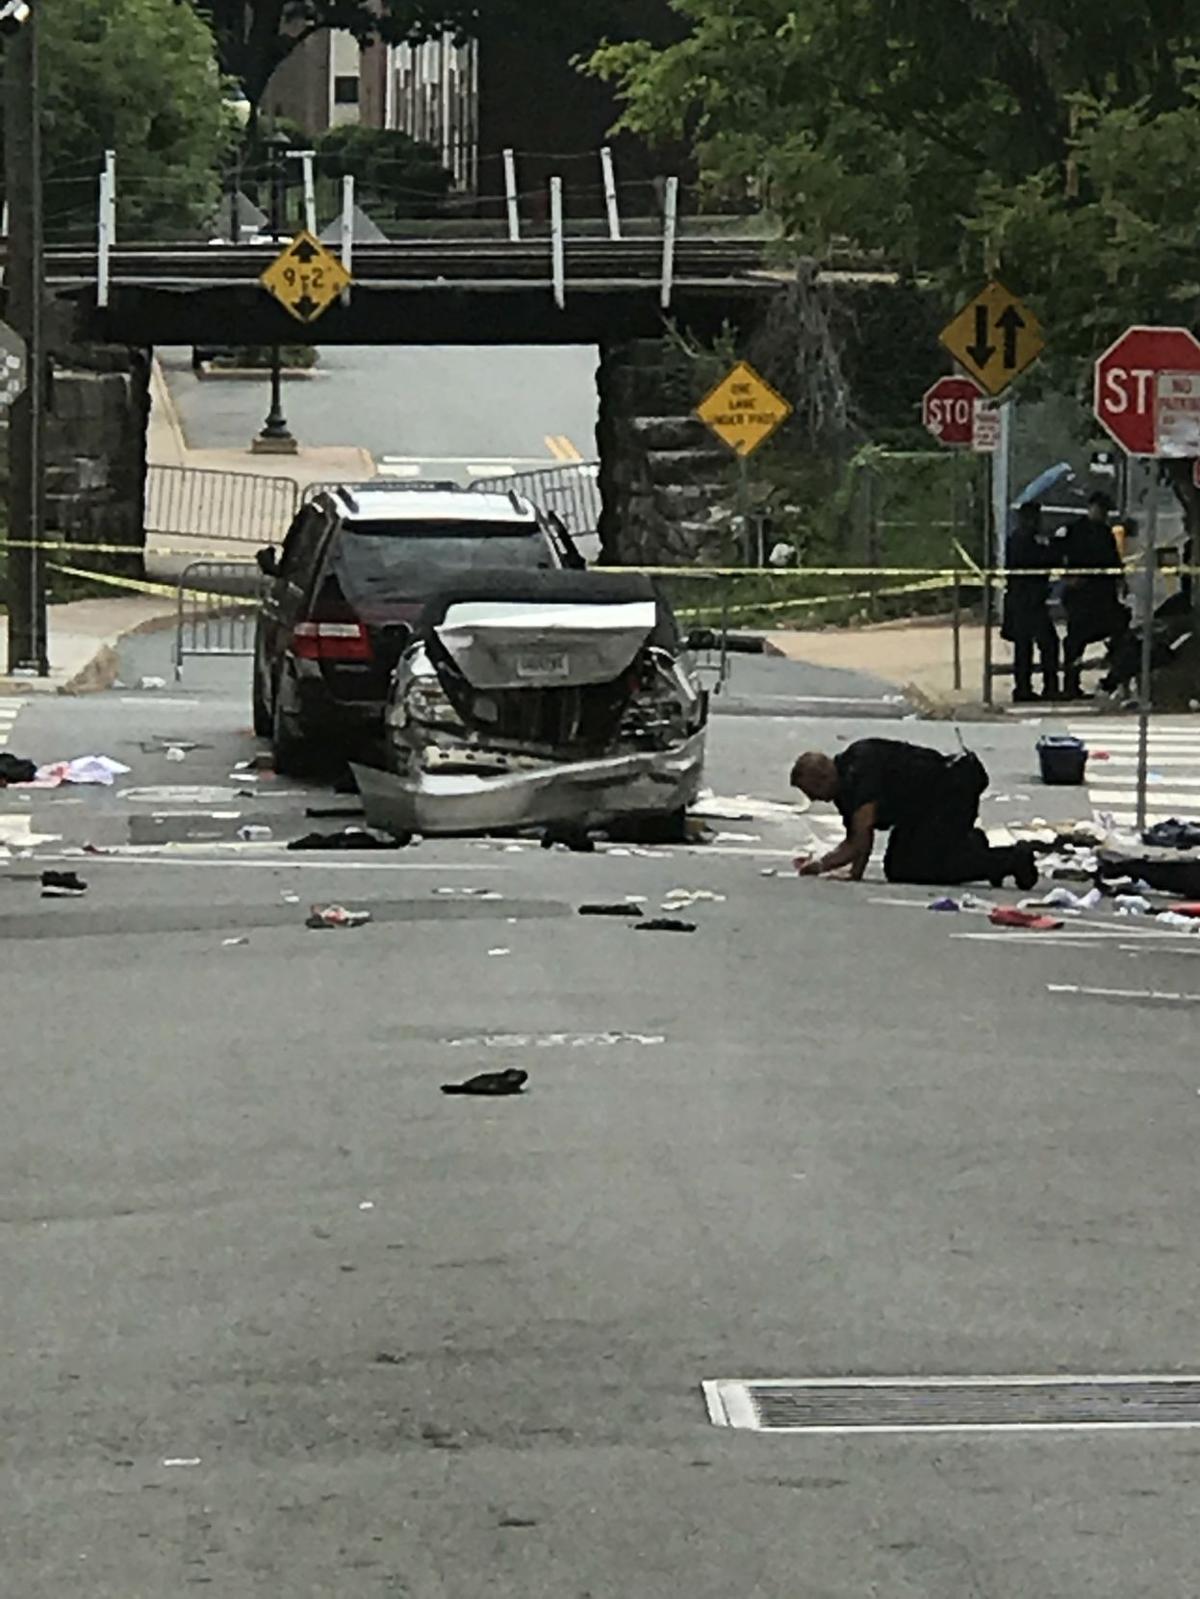 cville cop investiagting crash.JPG